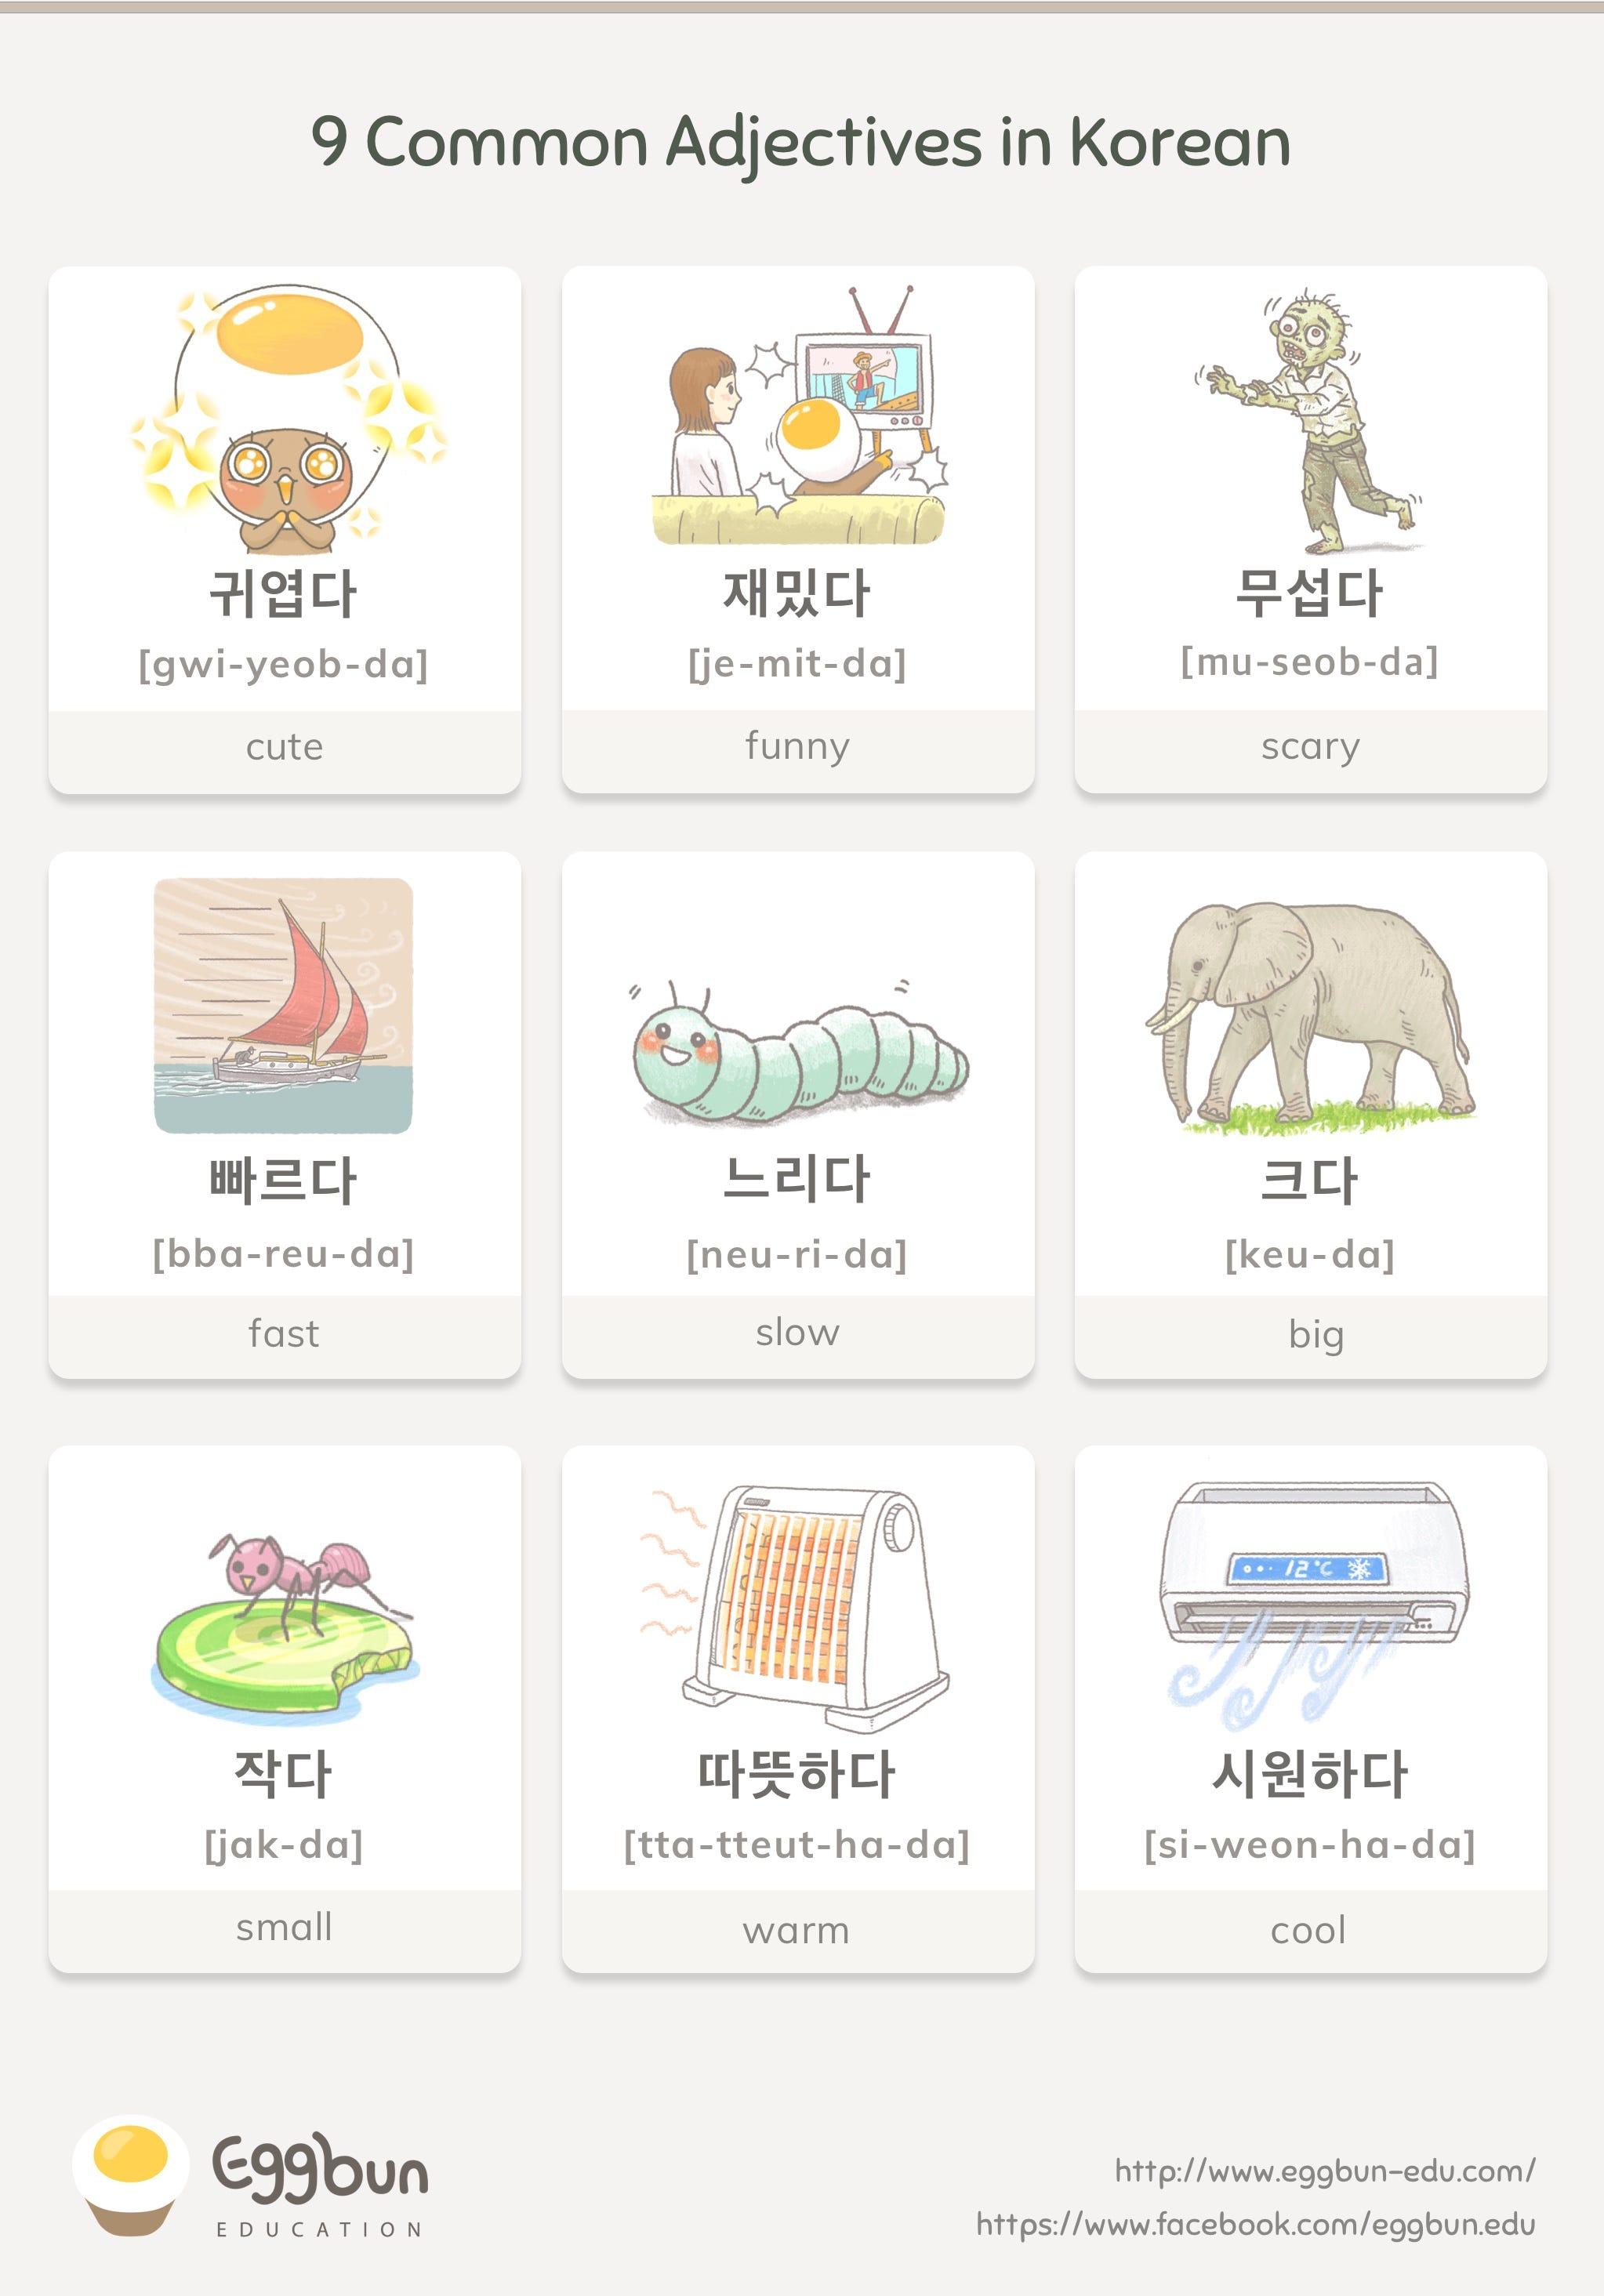 9 Common Adjectives In Korean